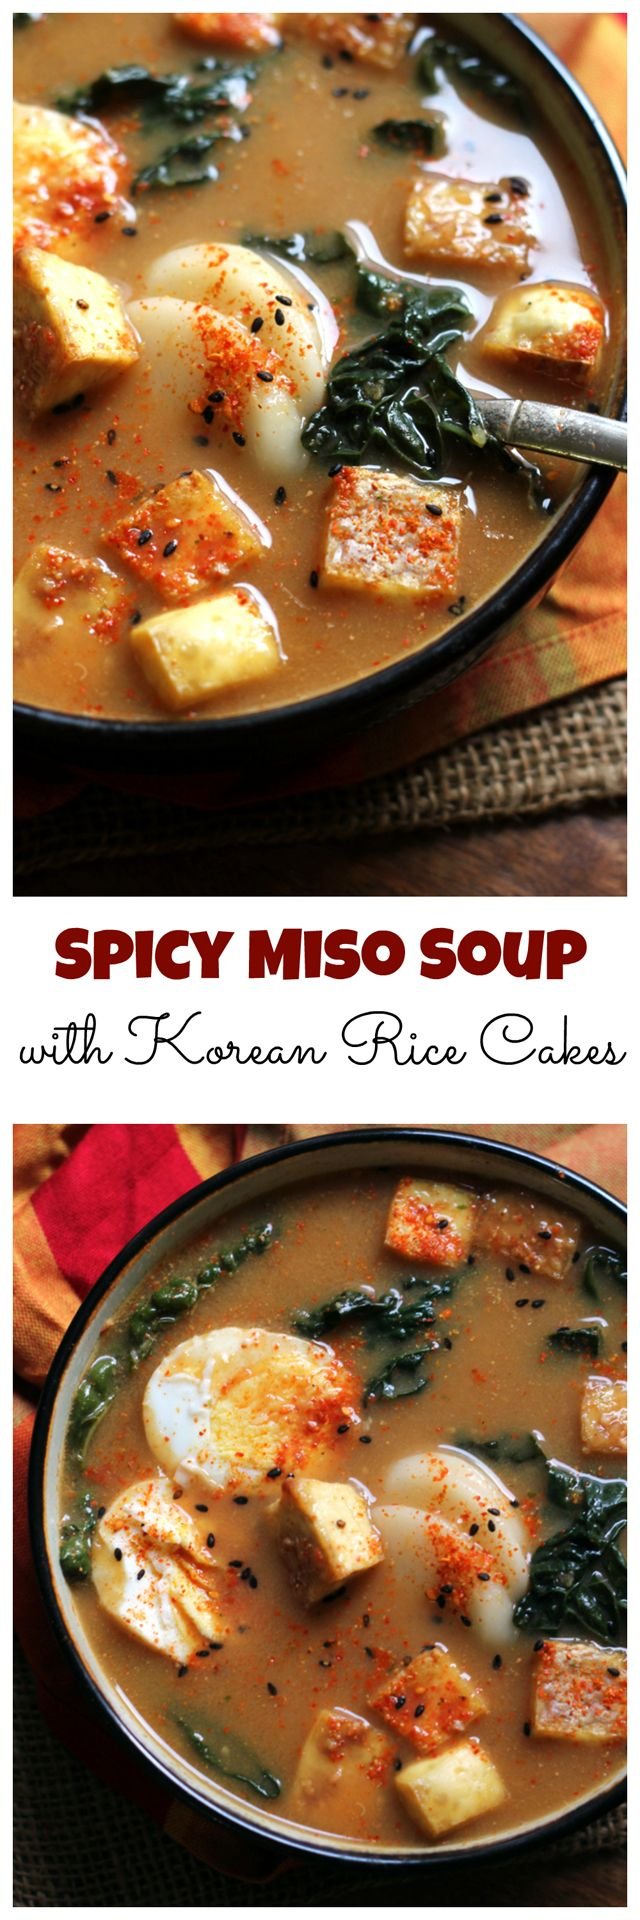 Blue apron korean rice cakes - Spicy Miso Soup With Korean Rice Cakes